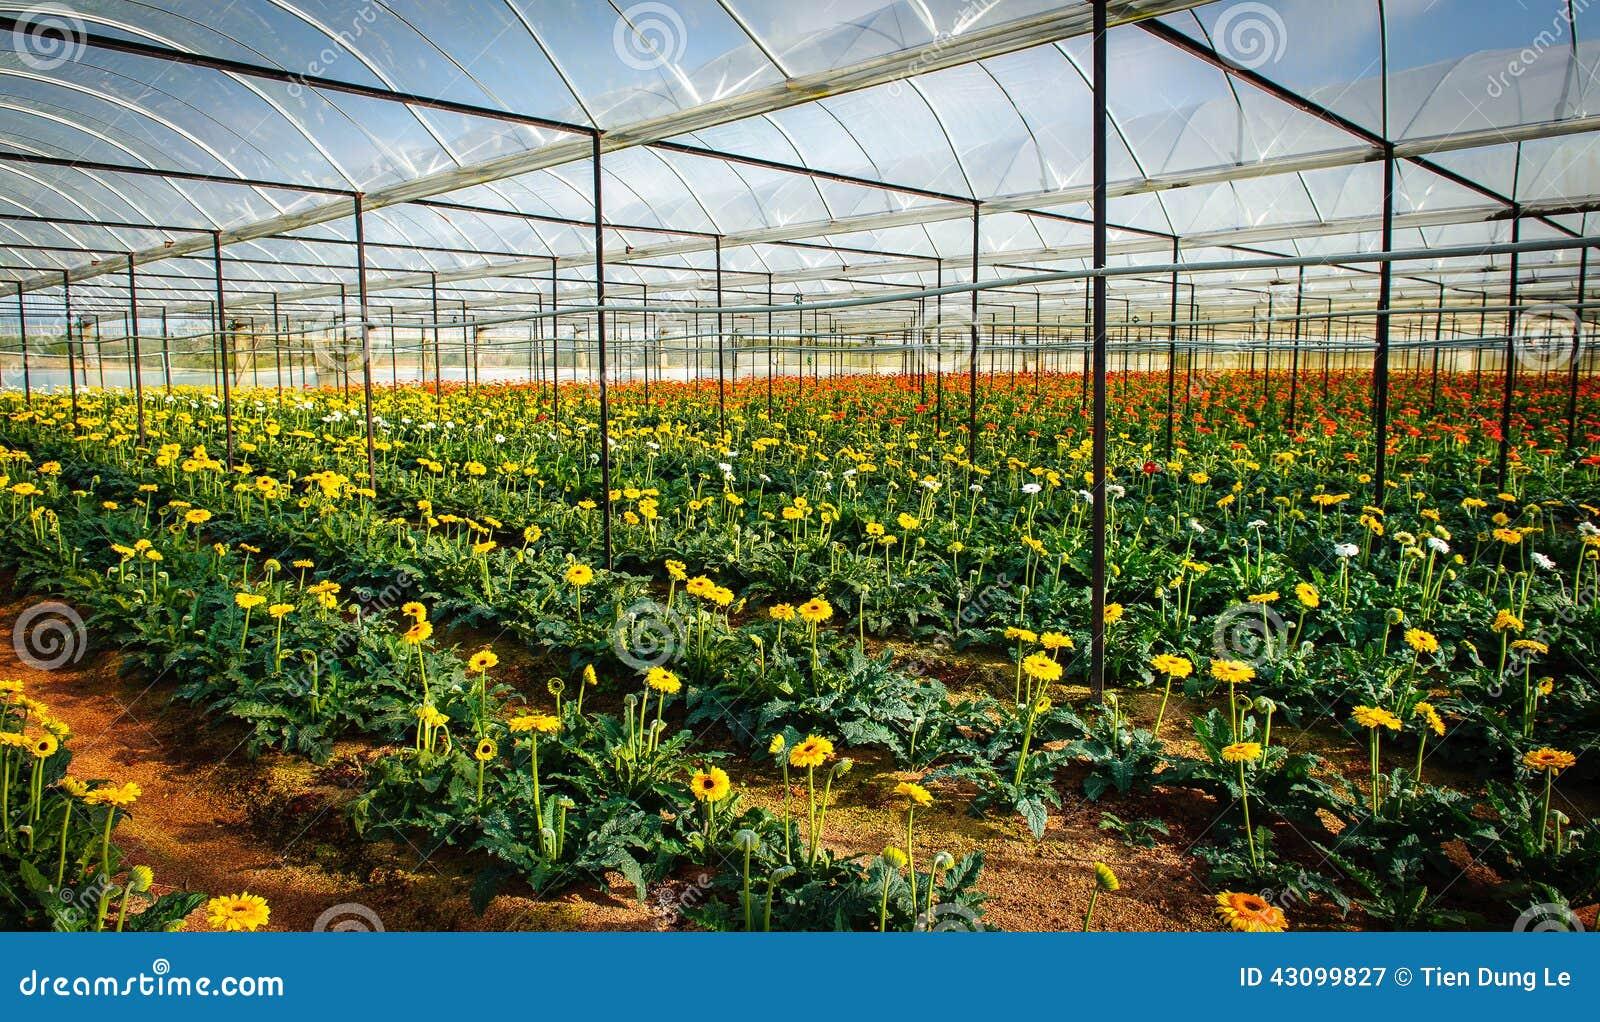 plantation des fleurs en serre chaude image stock image du ethnicity ville 43099827. Black Bedroom Furniture Sets. Home Design Ideas